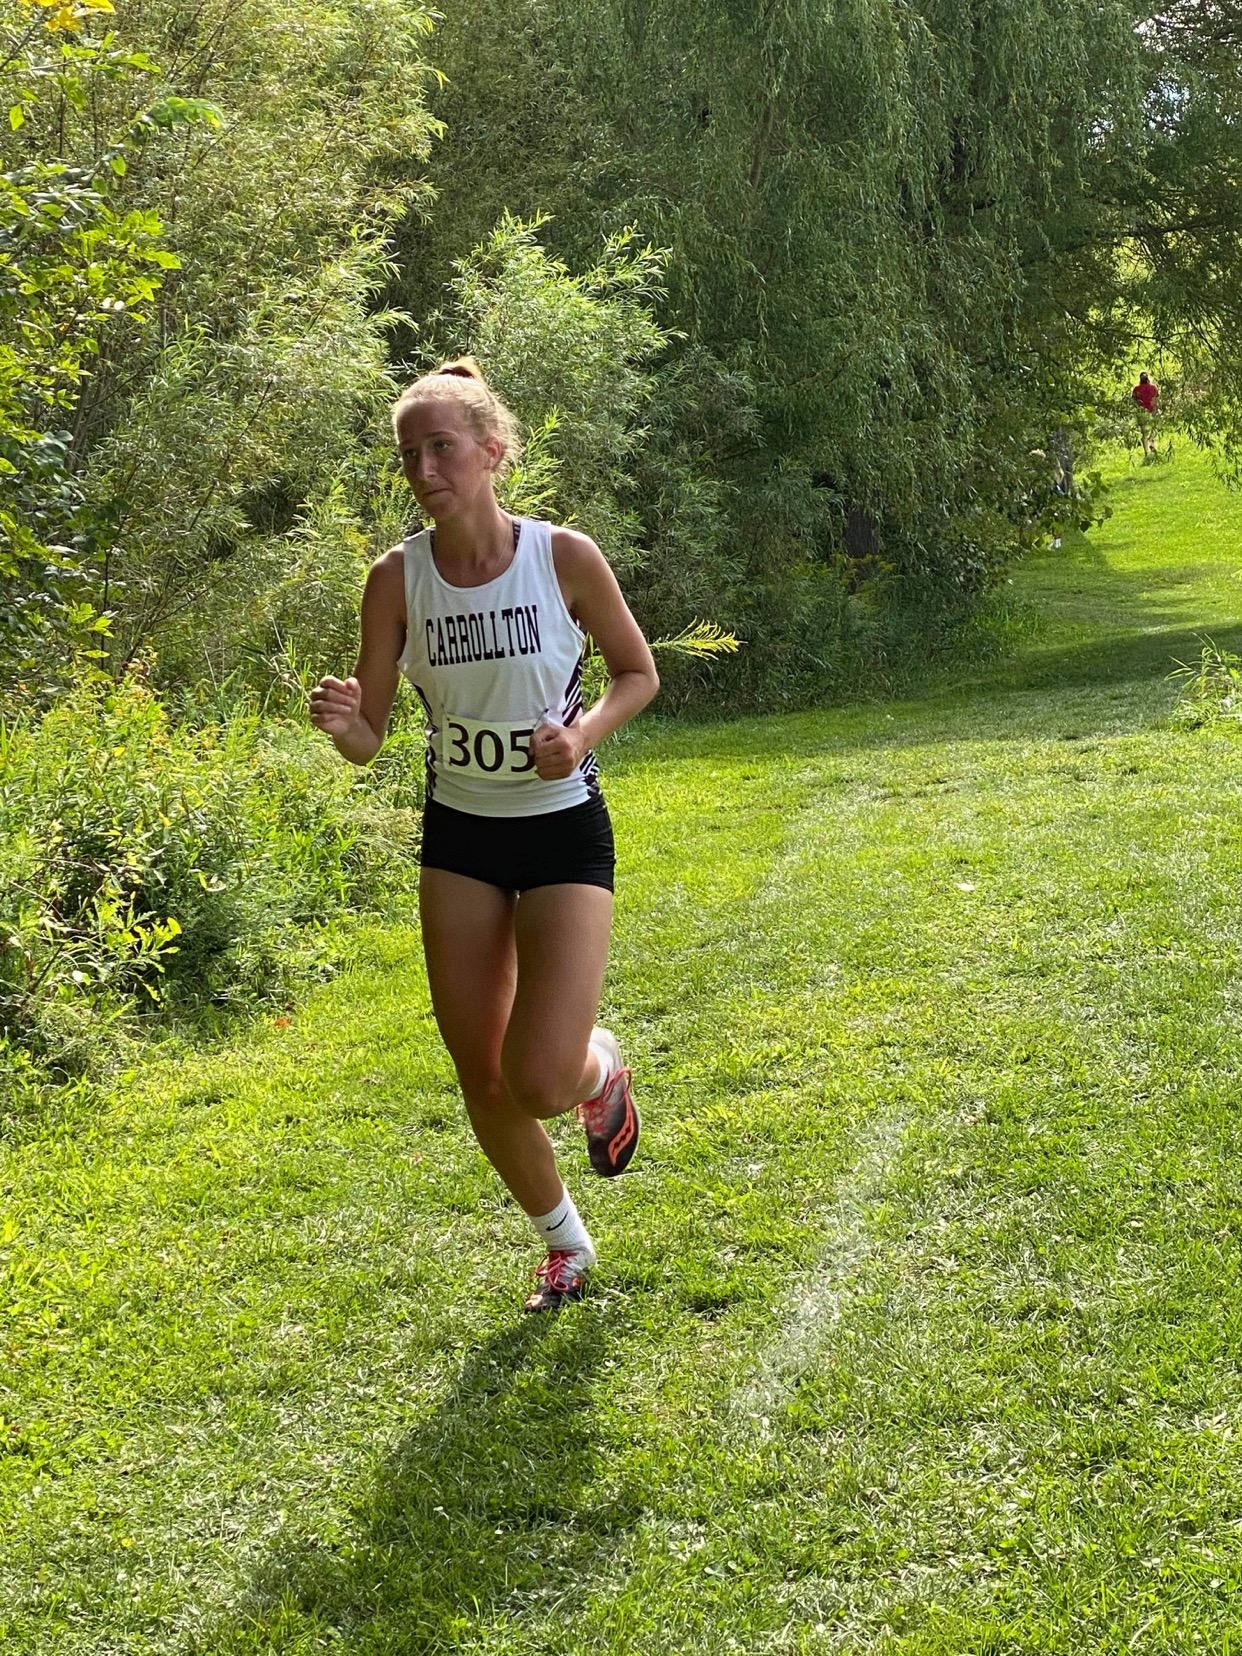 Carrollton cross country runner Hillari Baker competes at the Northwest Cross Country Invitational at GlenOak High School on Saturday, September 4, 2021.